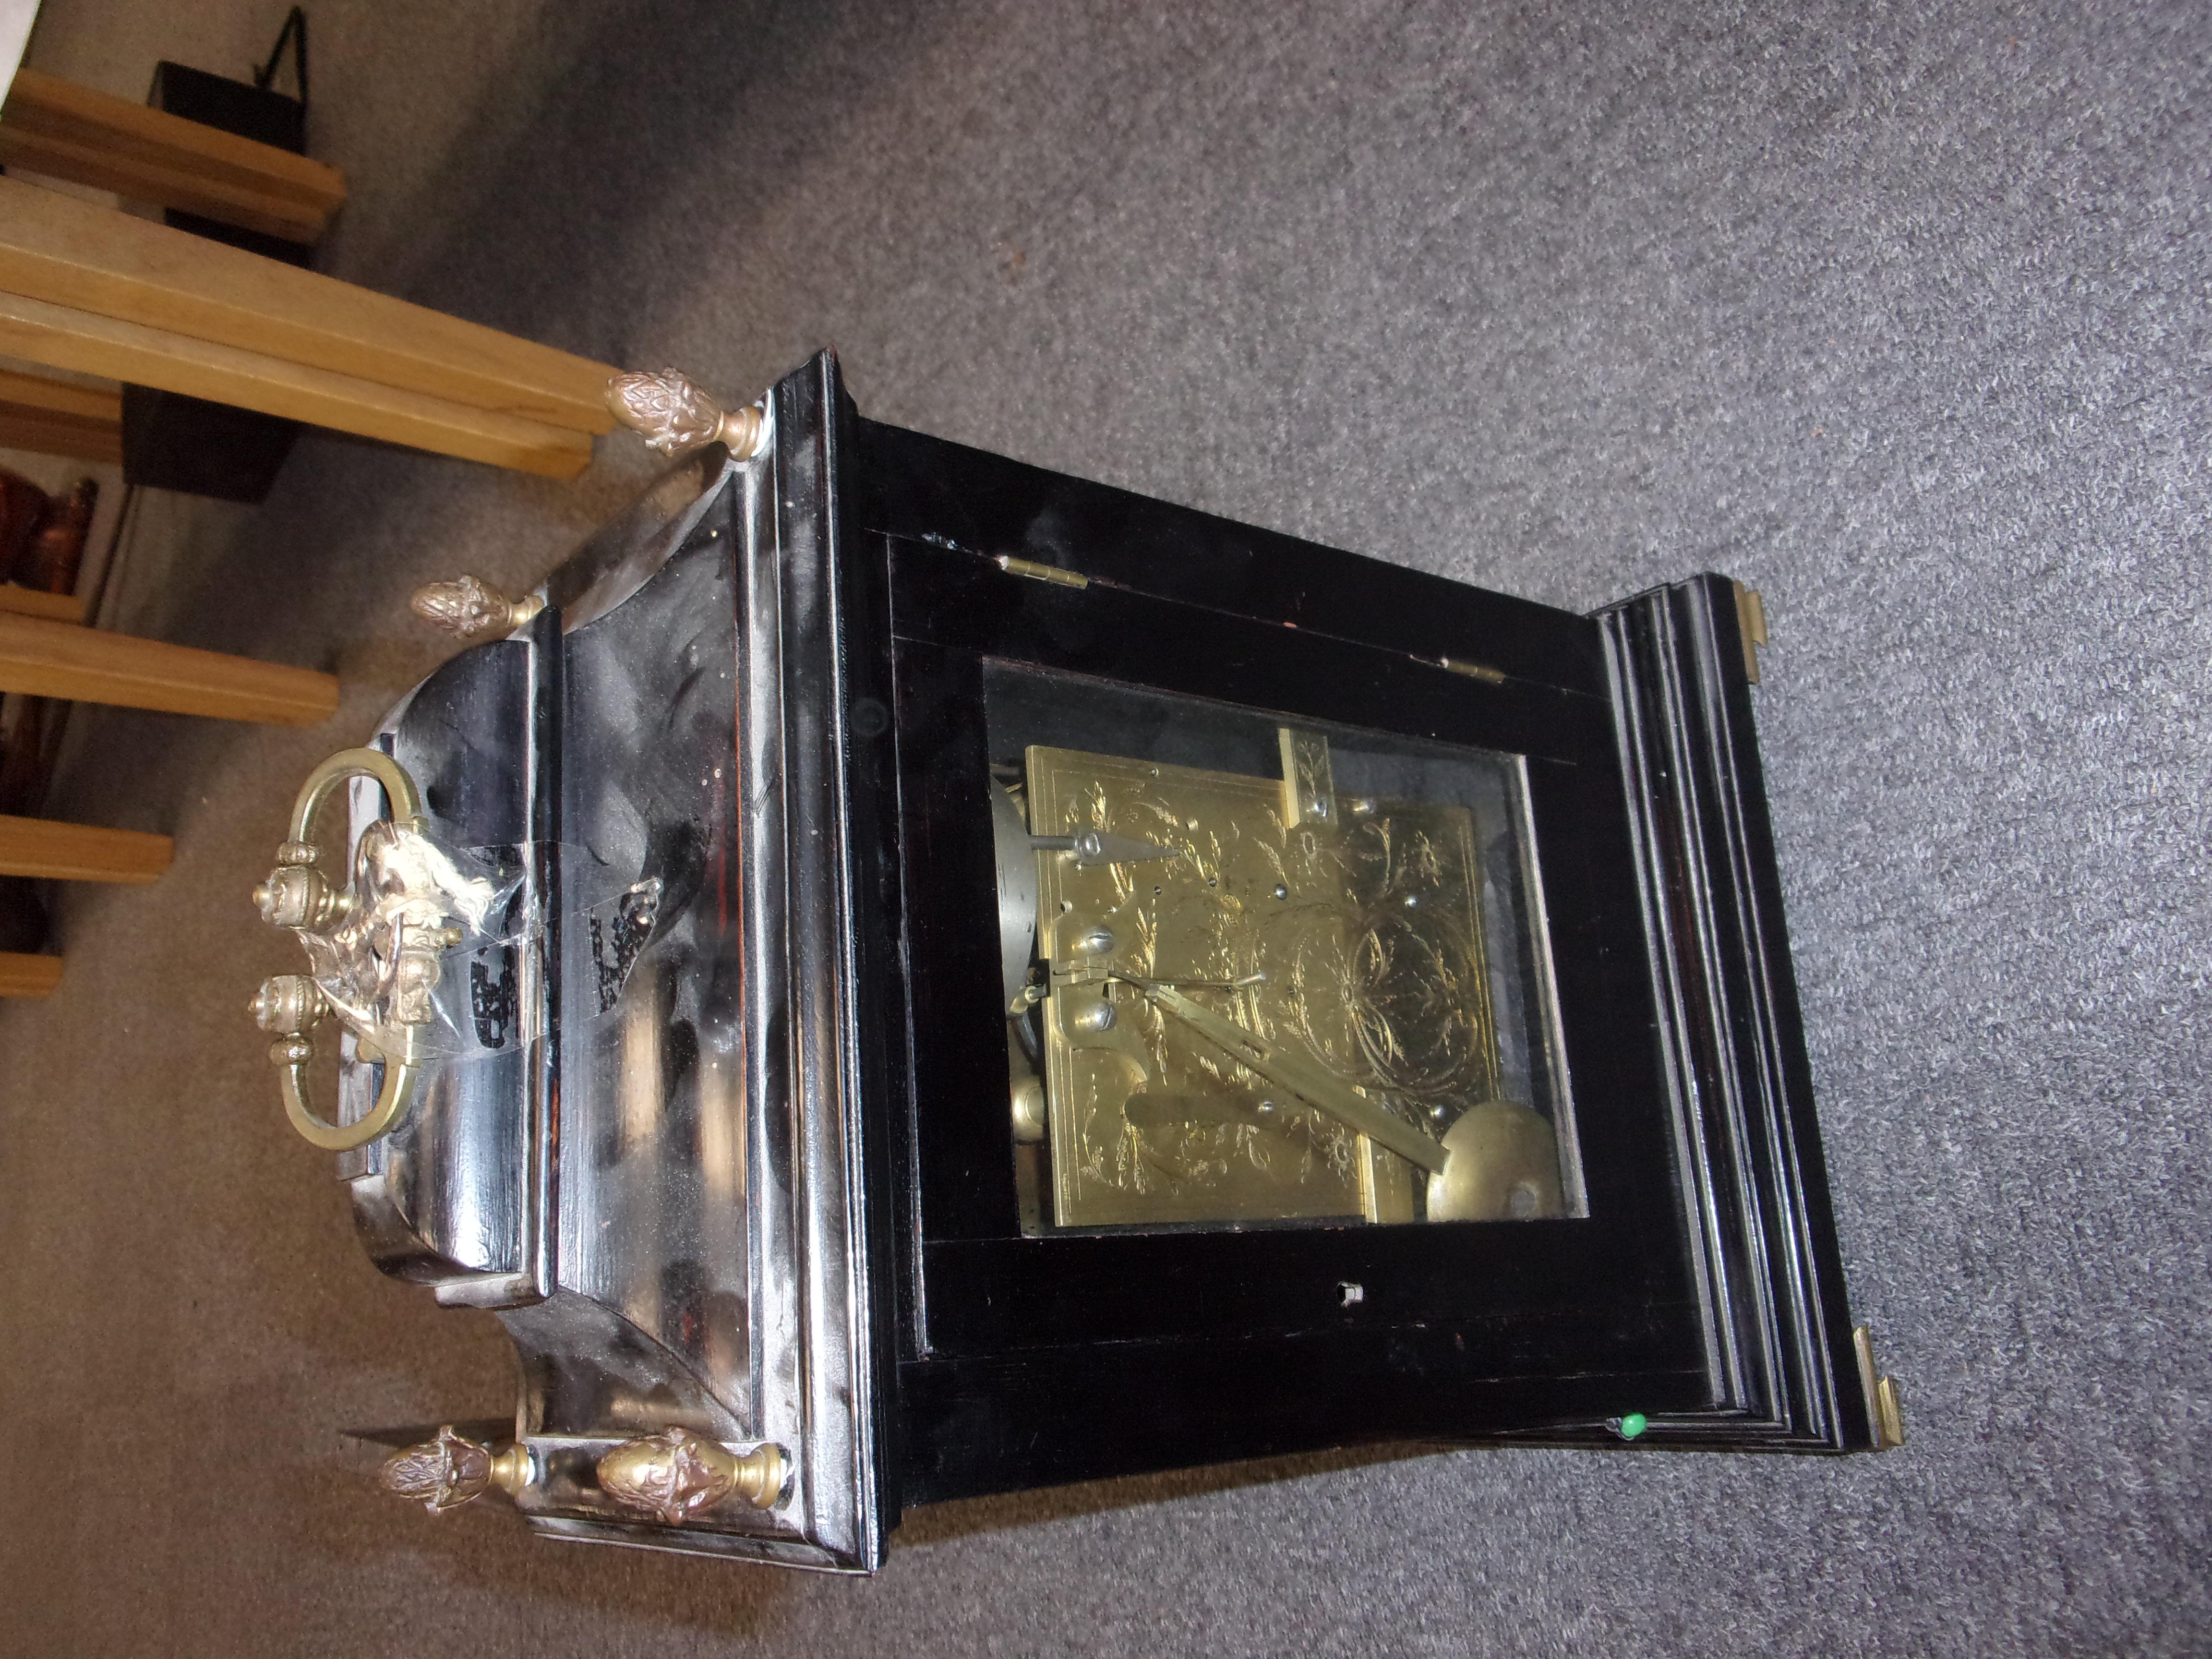 LATE 18C BRACKET CLOCK - Image 5 of 11